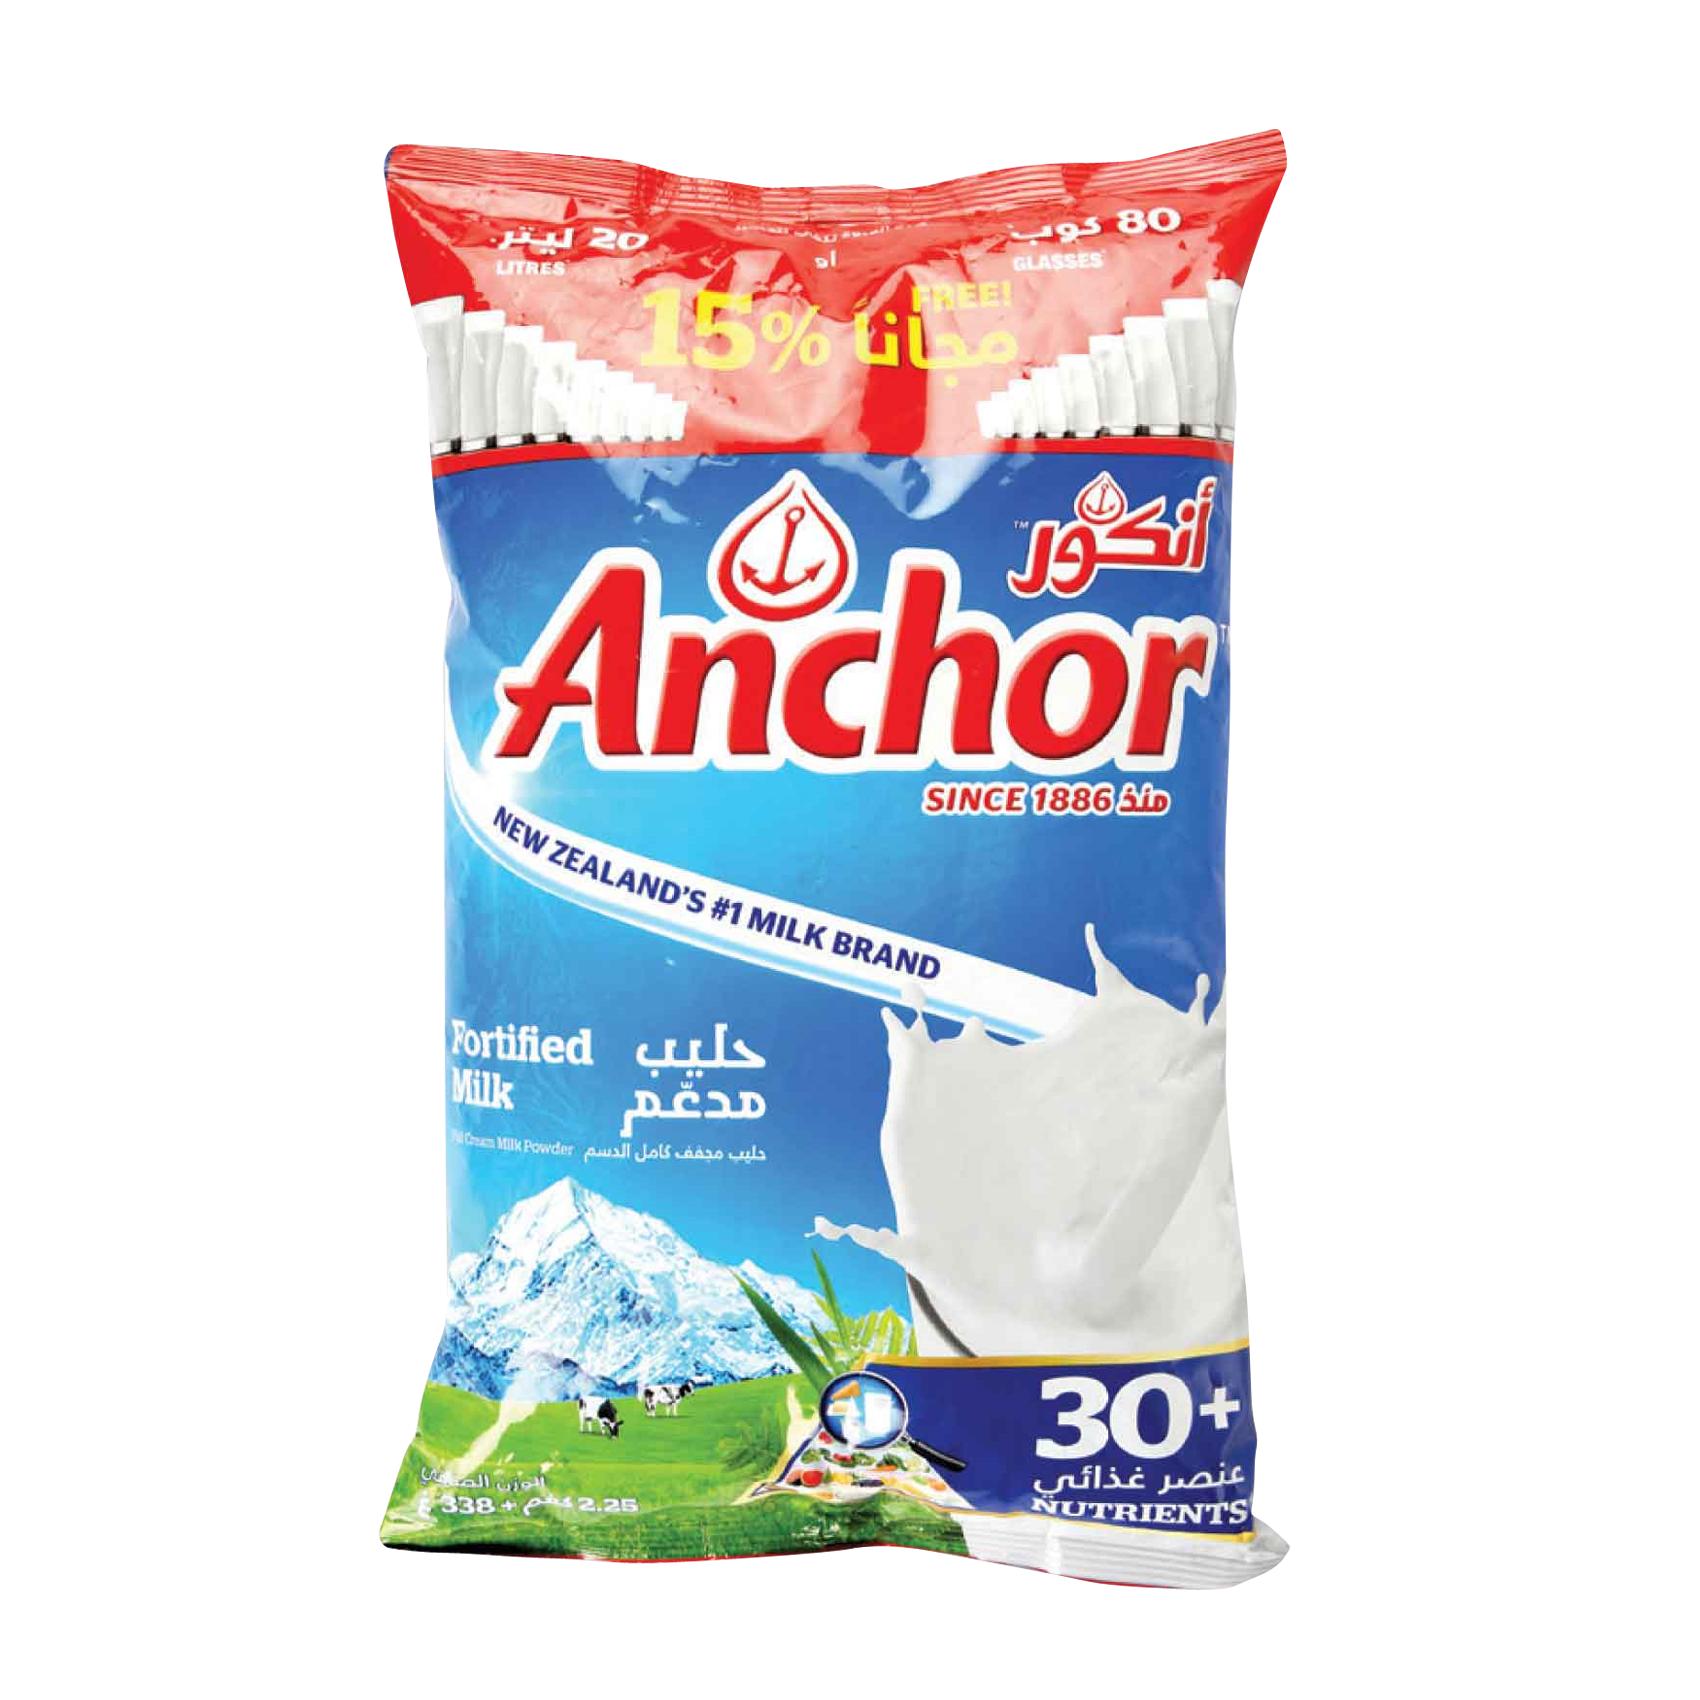 ANCHOR MILK POWDER SACHET 2.25KG